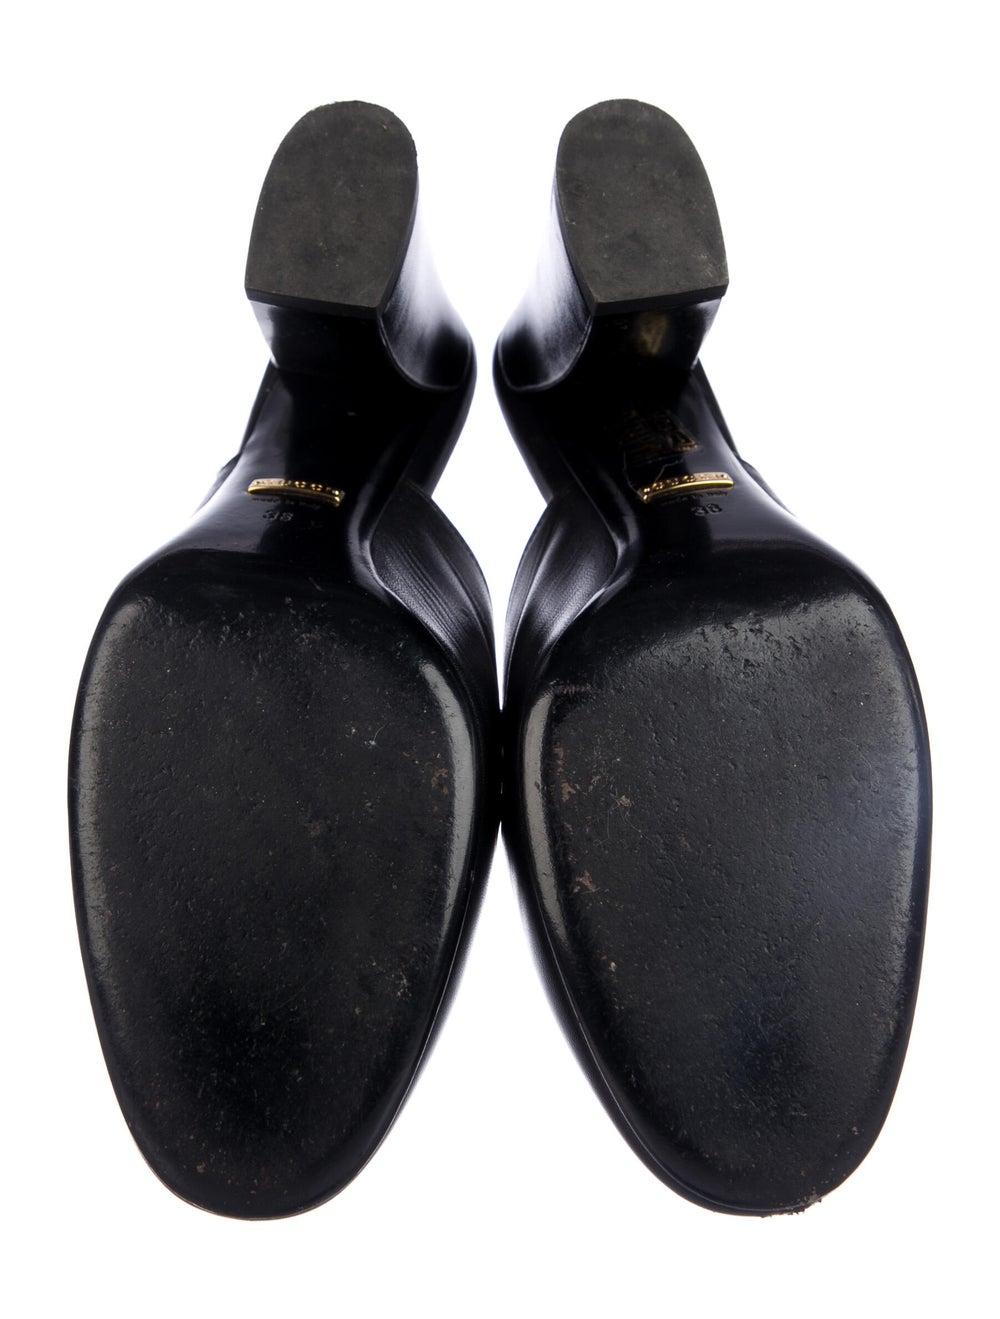 Gucci 1955 Horsebit Accent Leather Mules Black - image 5